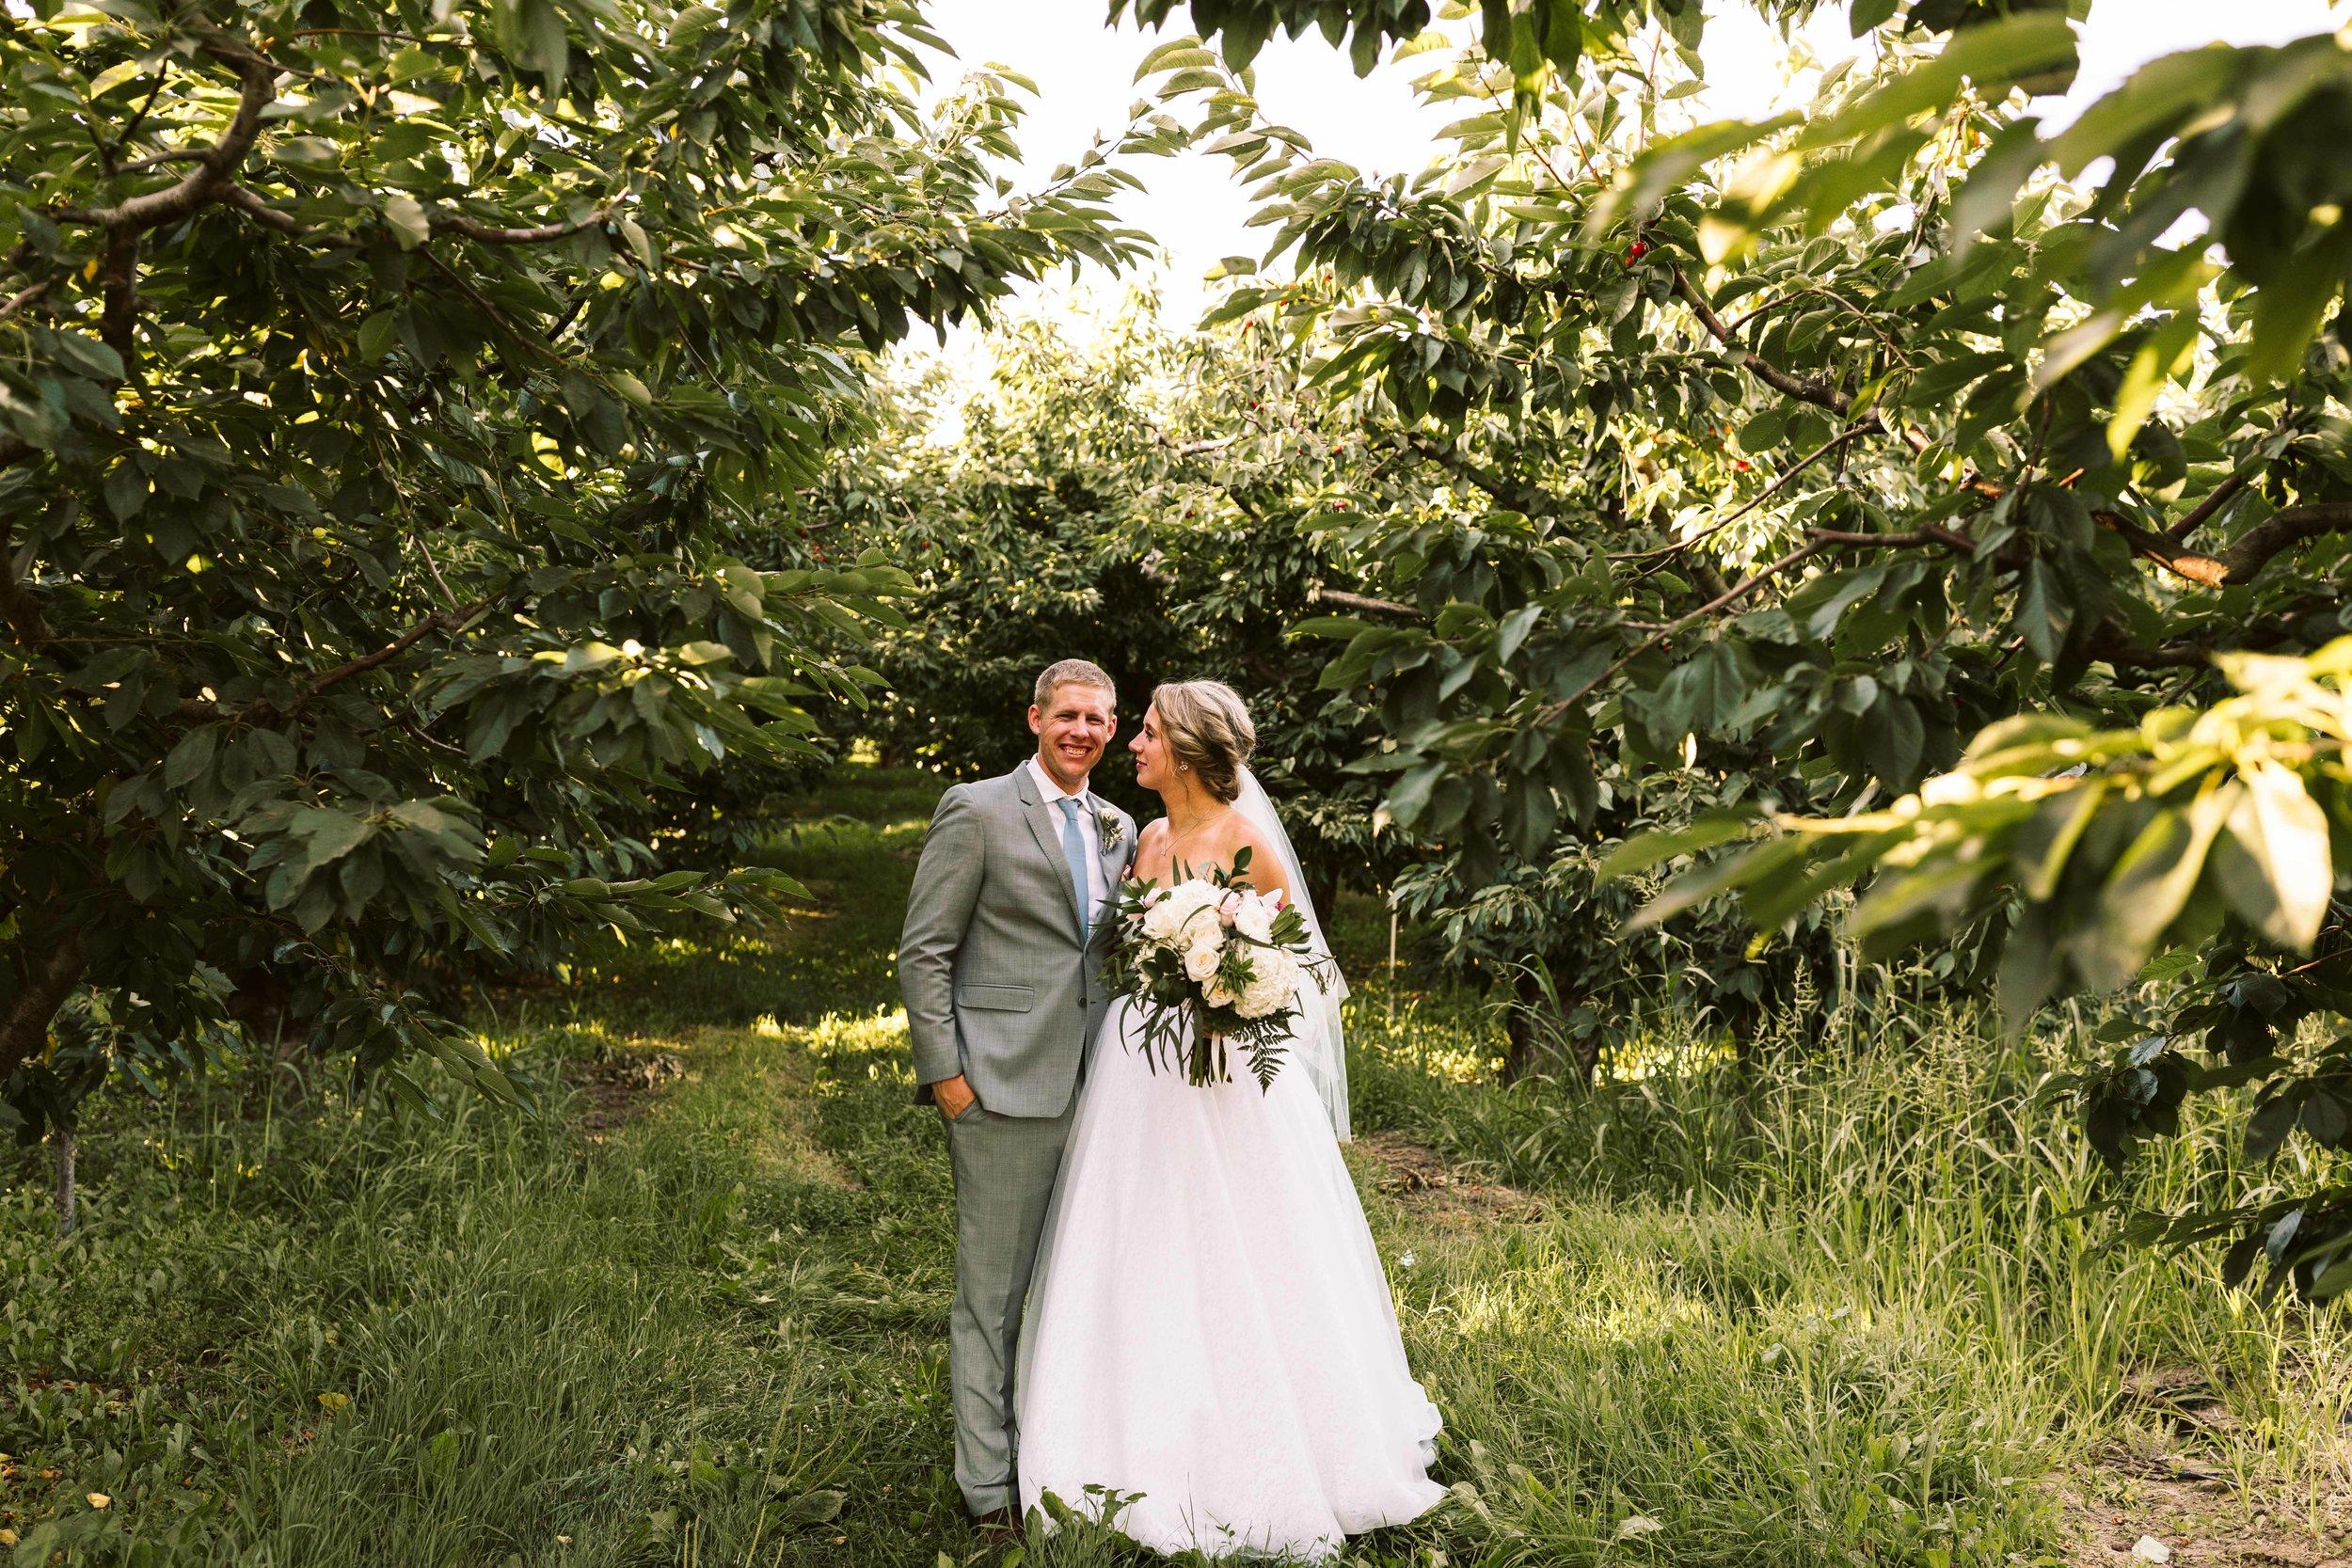 fontaine-estates-wedding-86.jpg